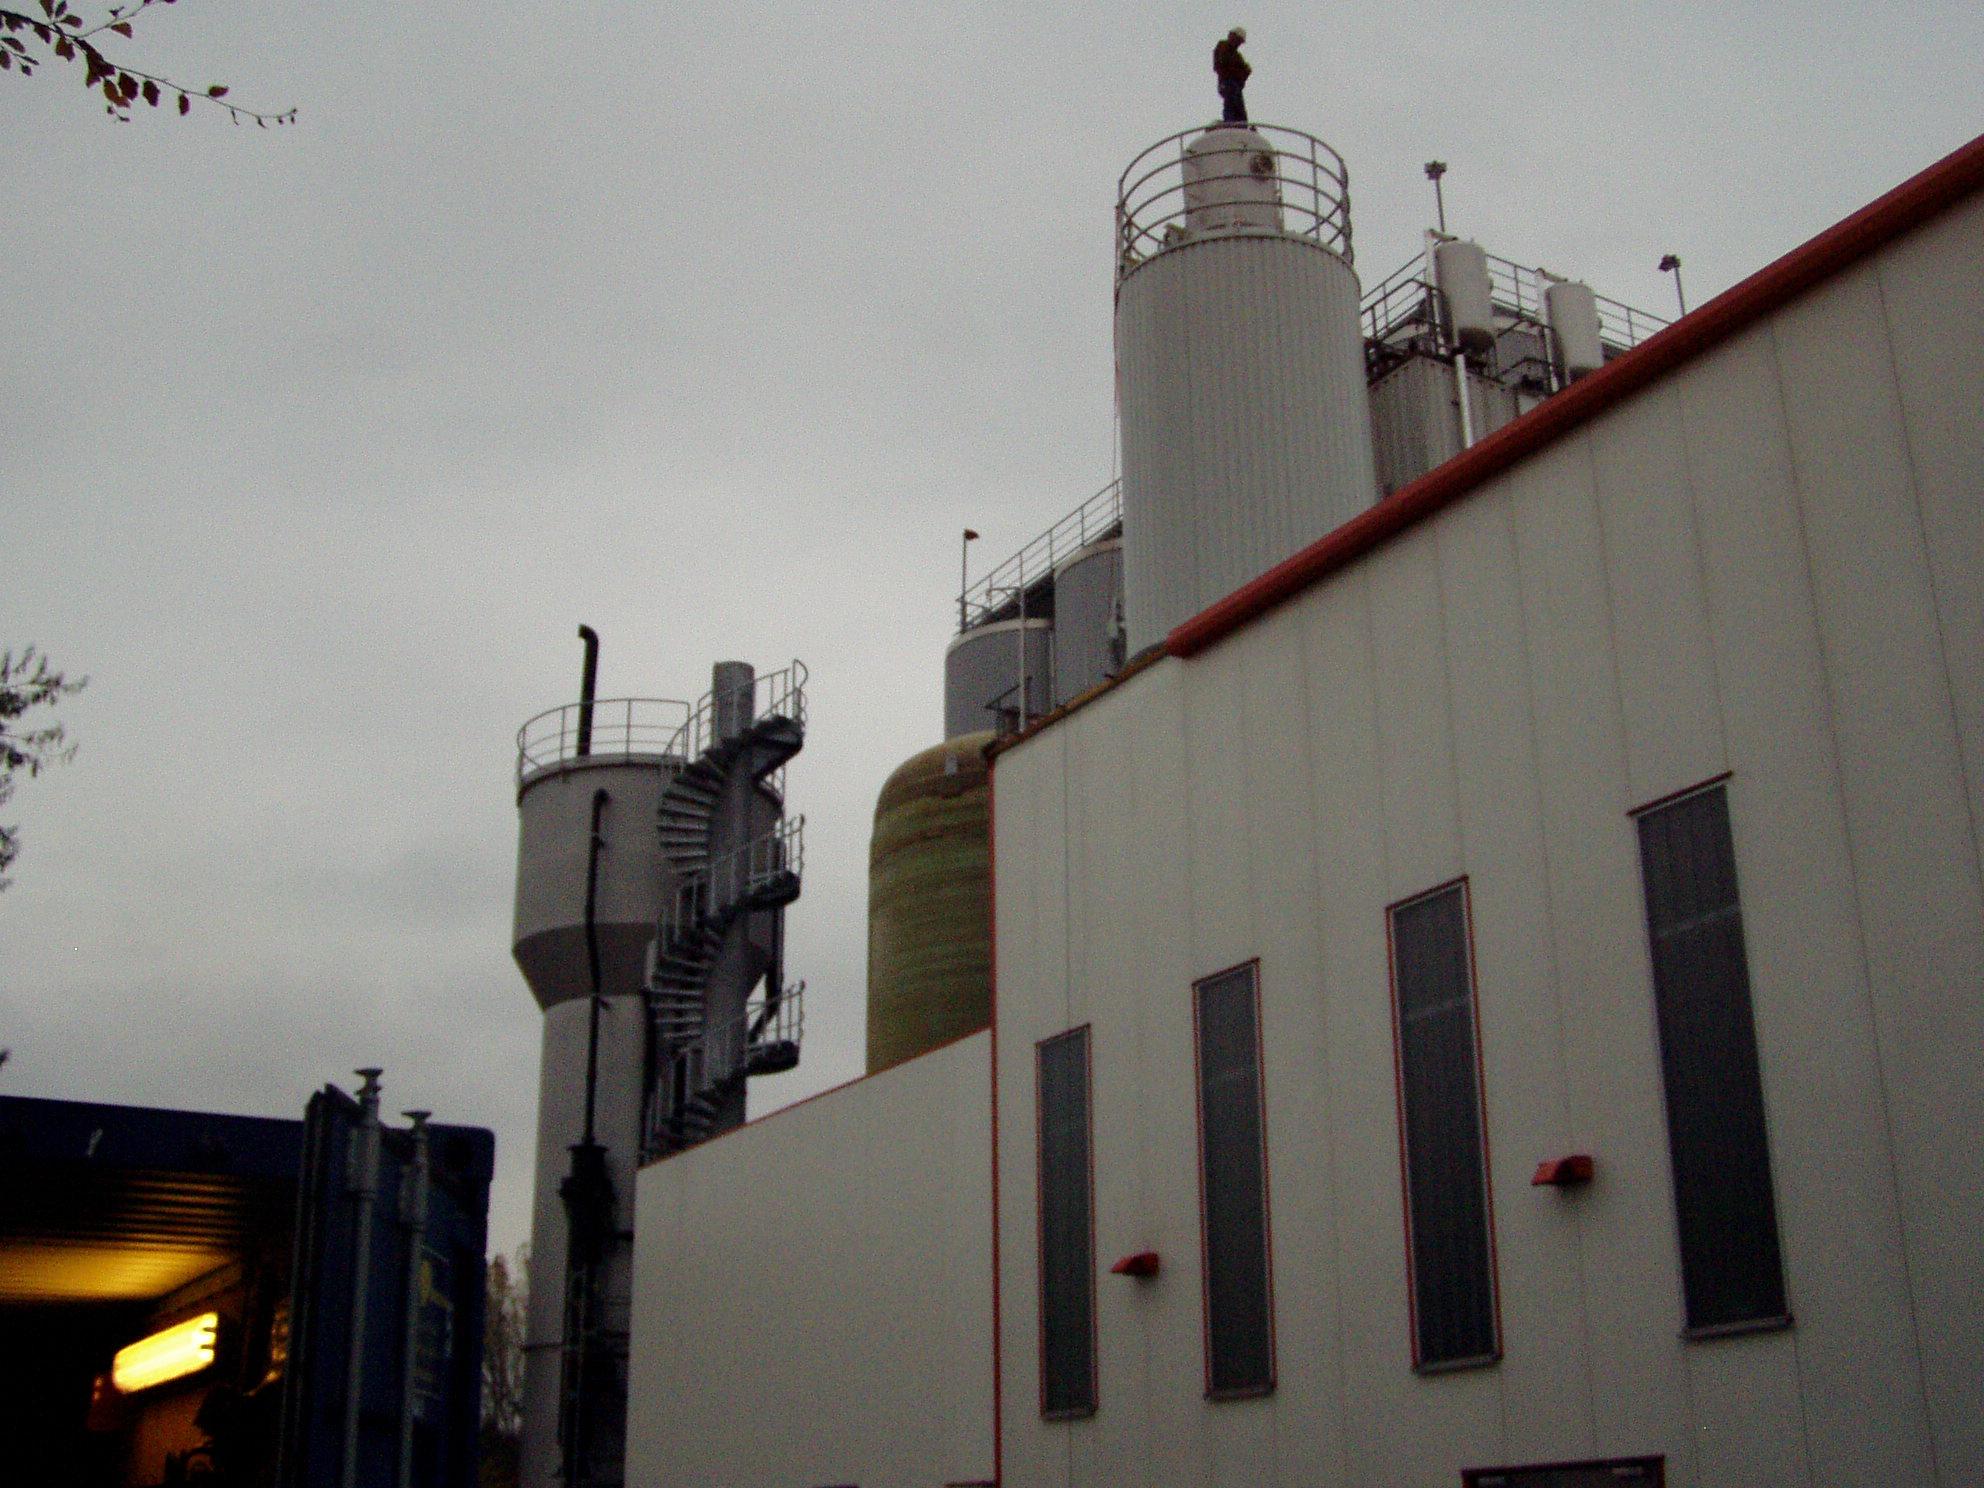 Brewery wastewater anaerobic